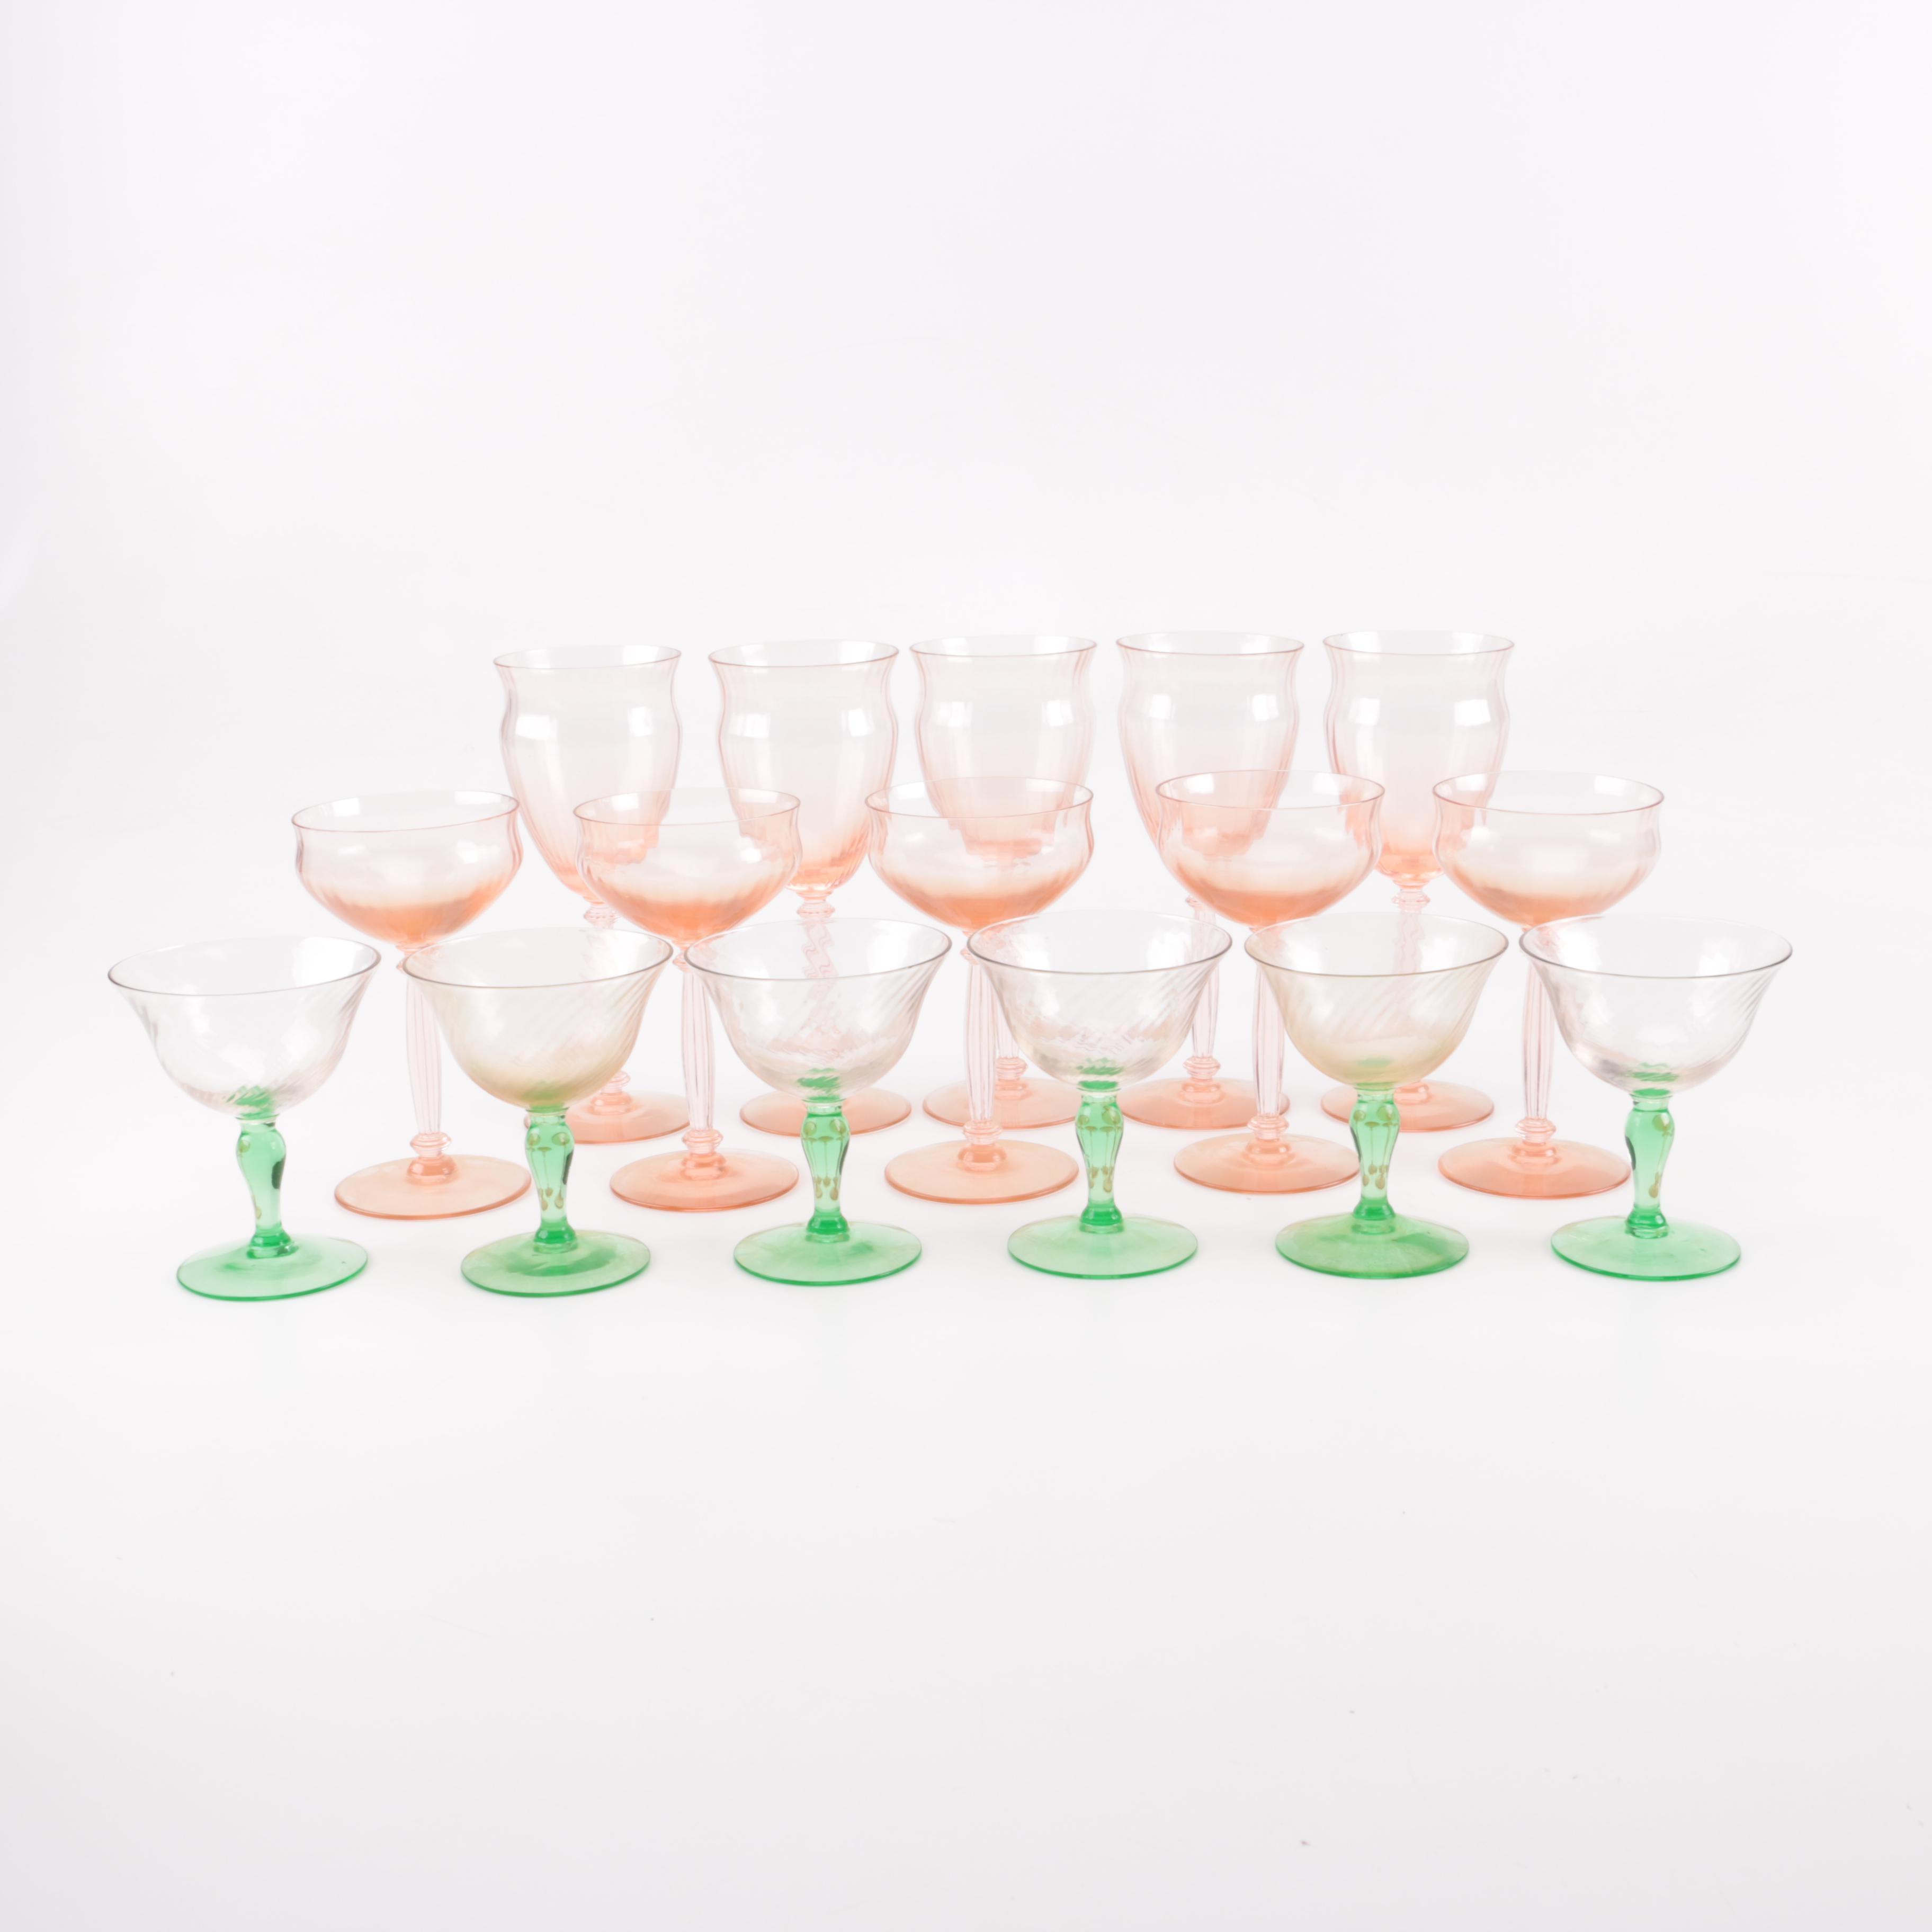 Collection of Depression Glass Stemware